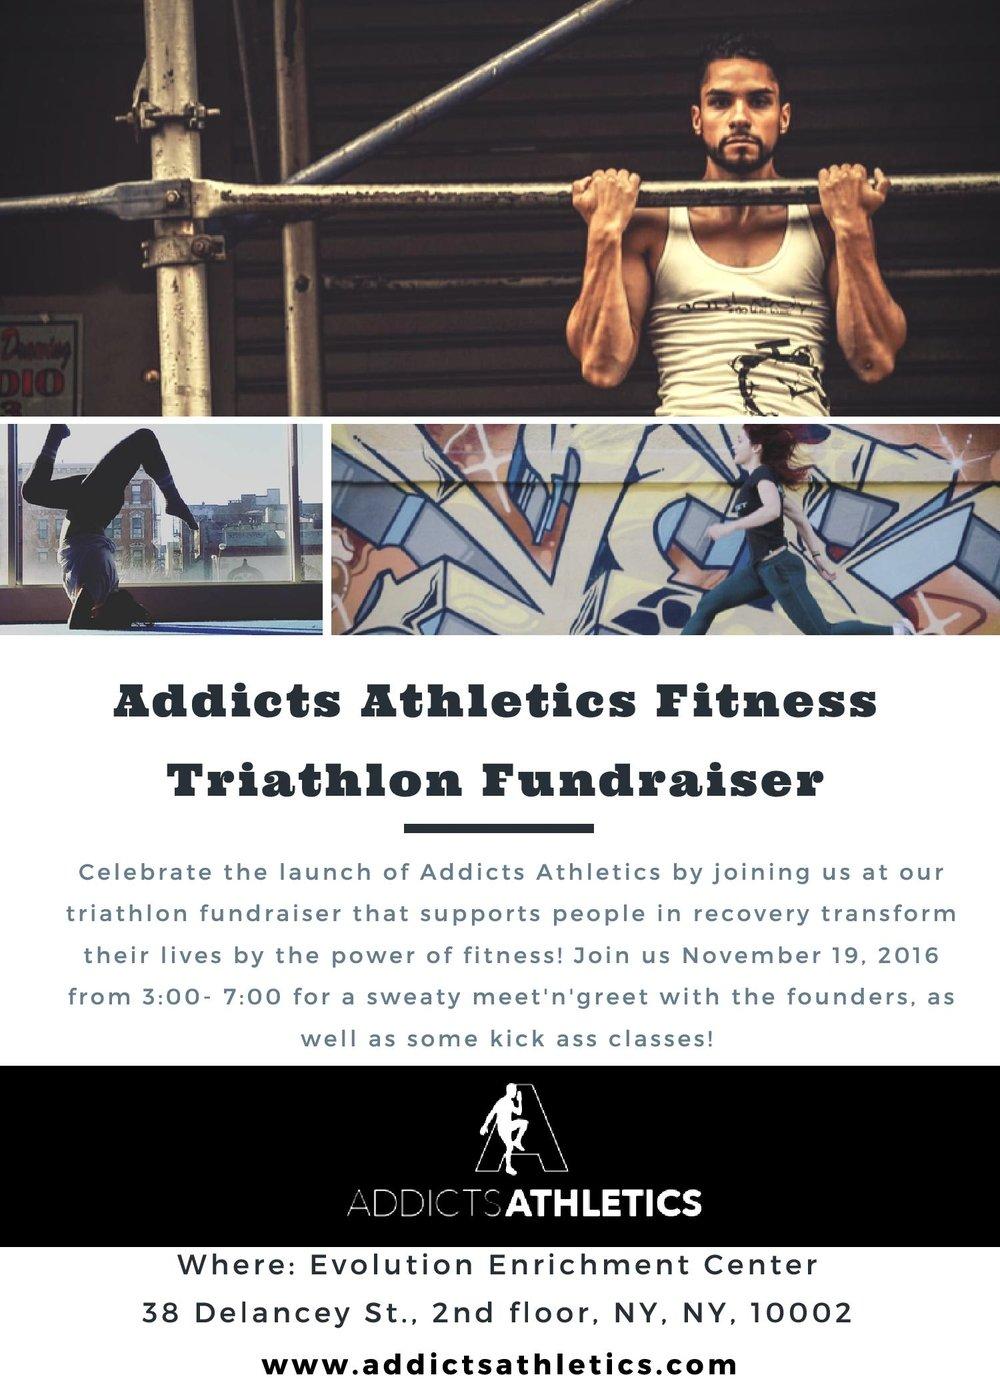 Addicts Athletics Fitness Triathlon